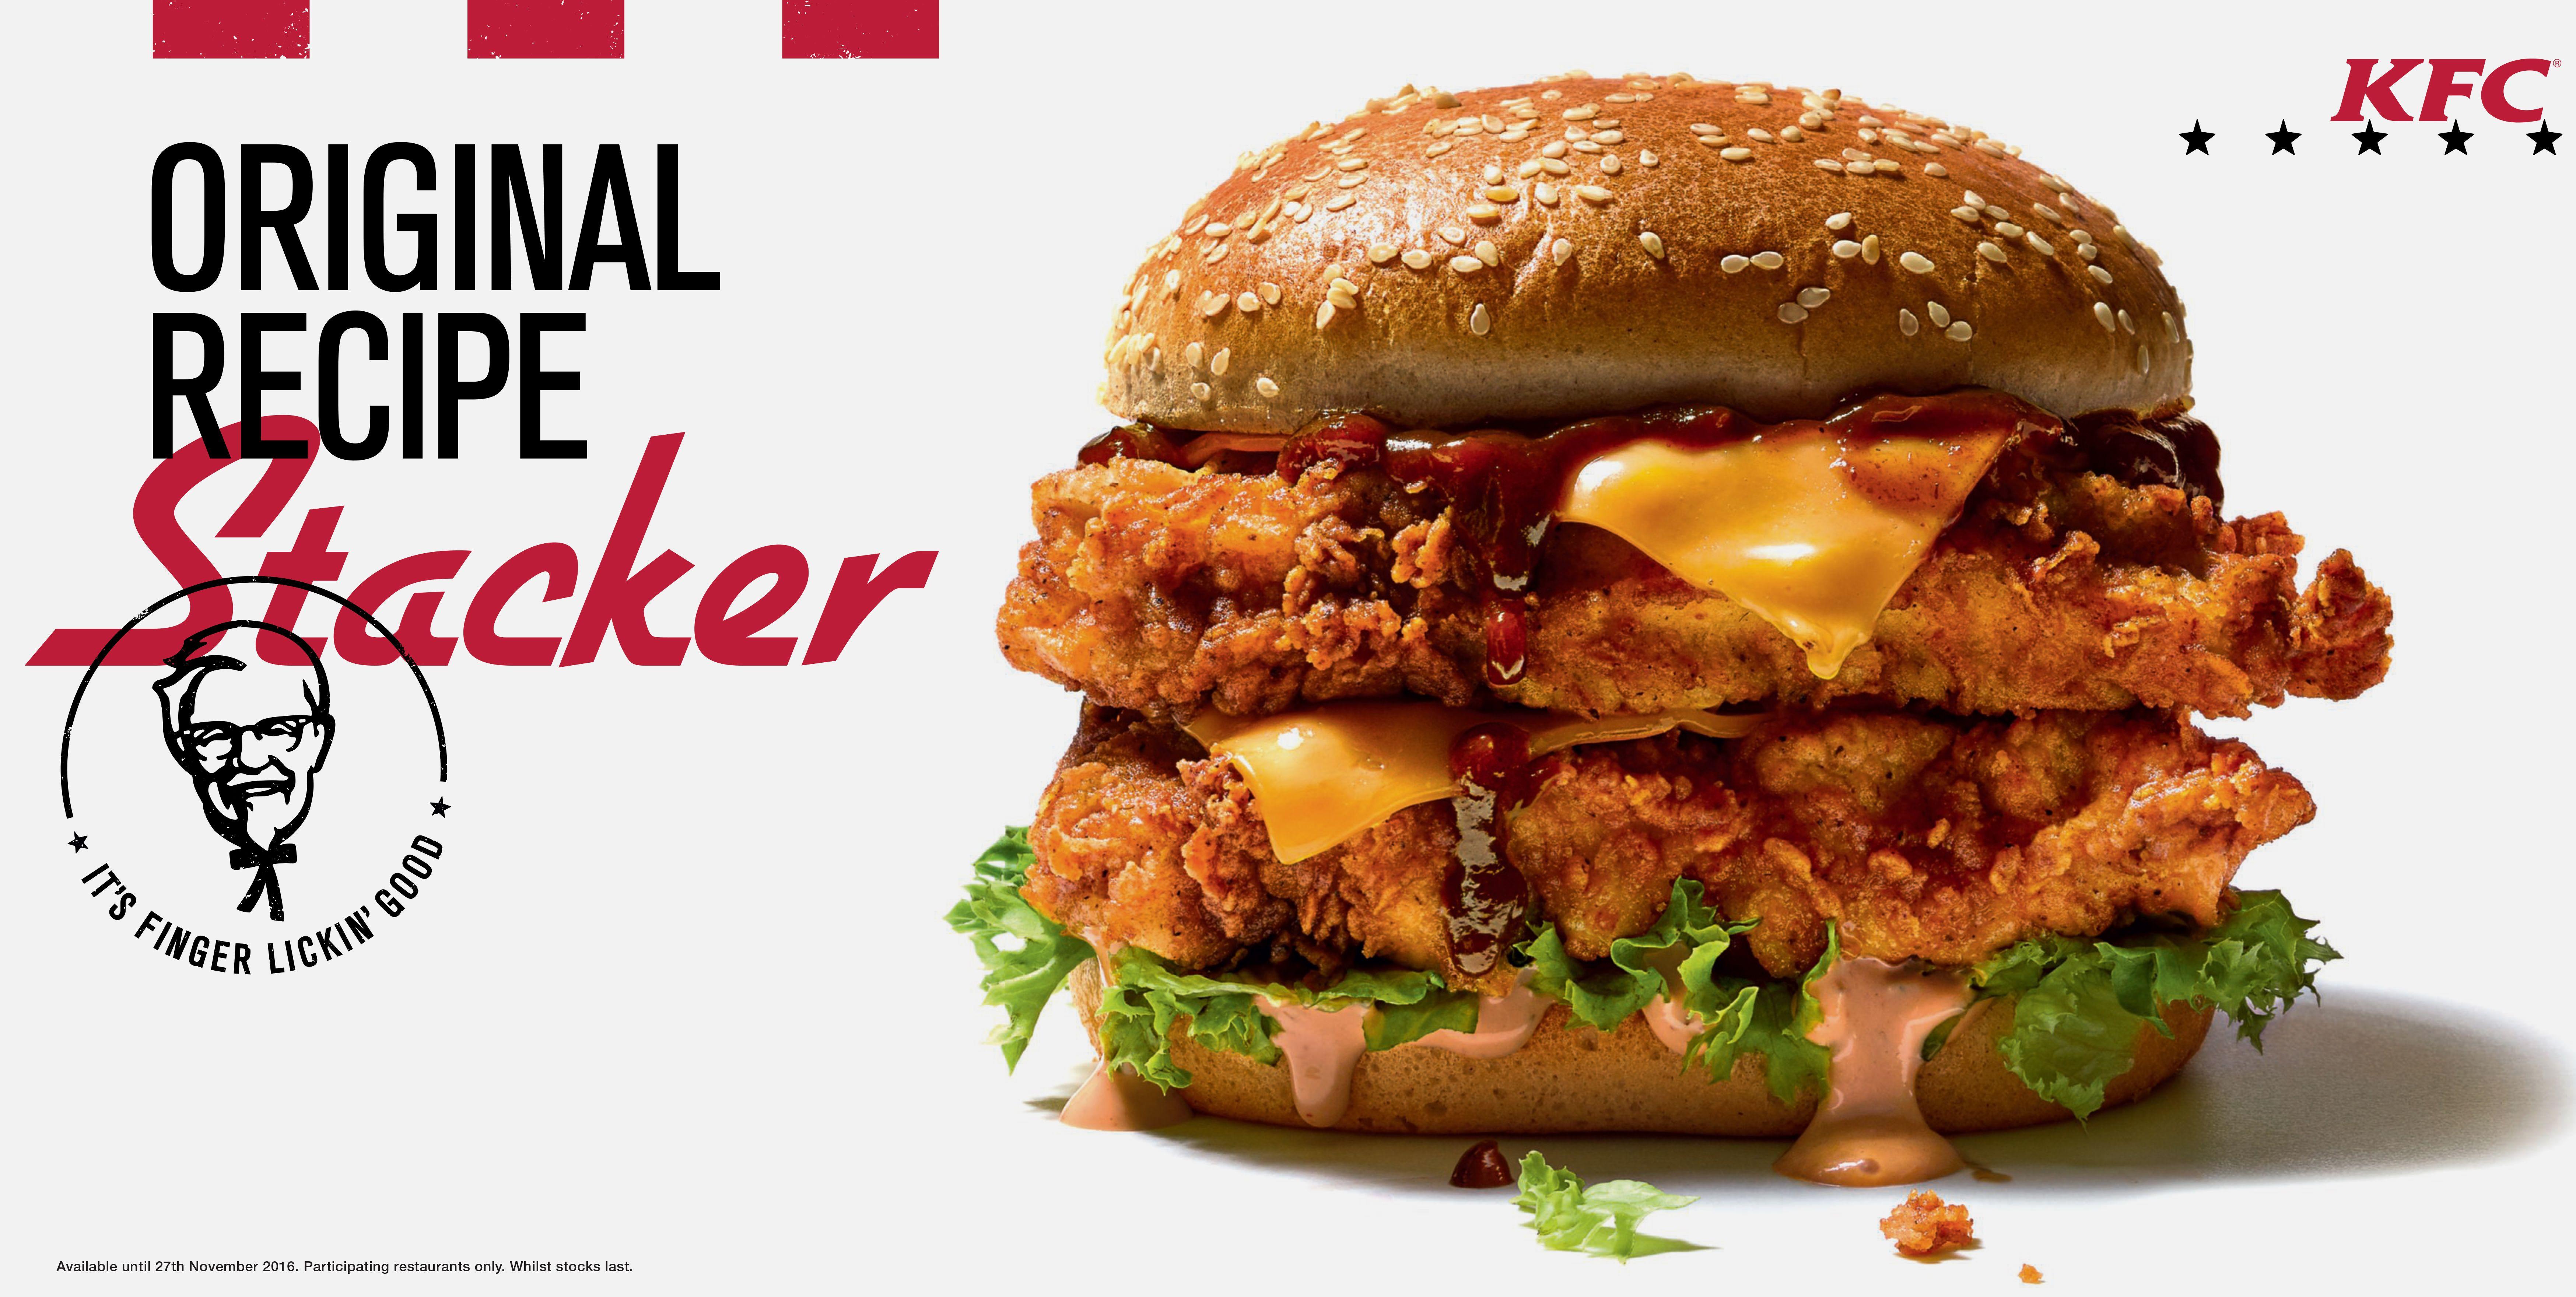 kfc product design Order kfc online choose your kfc chicken, hot & crispy, smoky grilled chicken, zinger, longer, hot wings and popcorn.